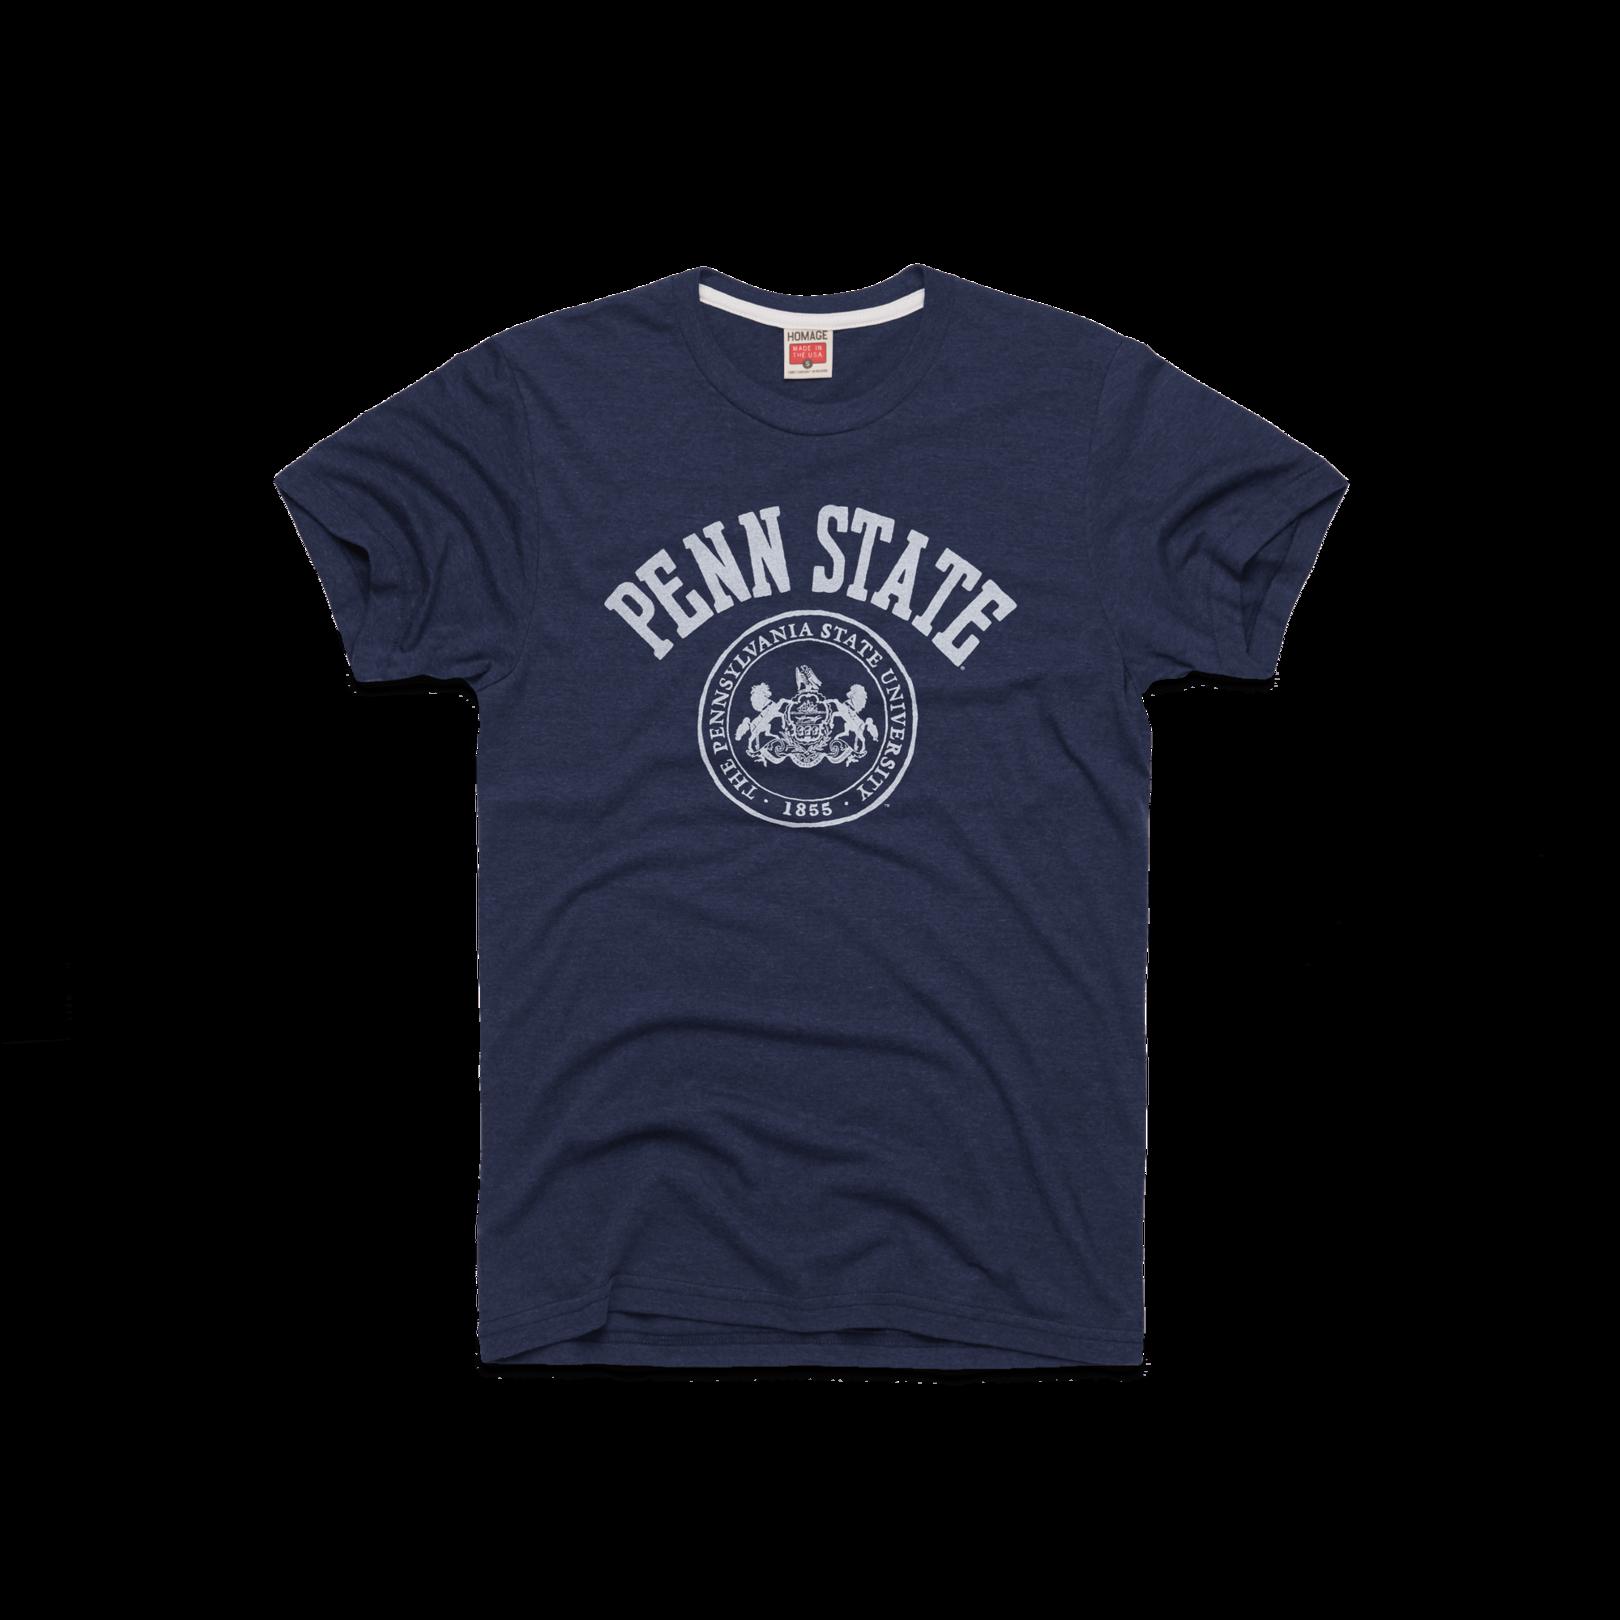 Penn State Seal Nittany Lions Retro University T Shirt Homage Long Sleeve Tshirt Men Mens Tops Vintage Outfits